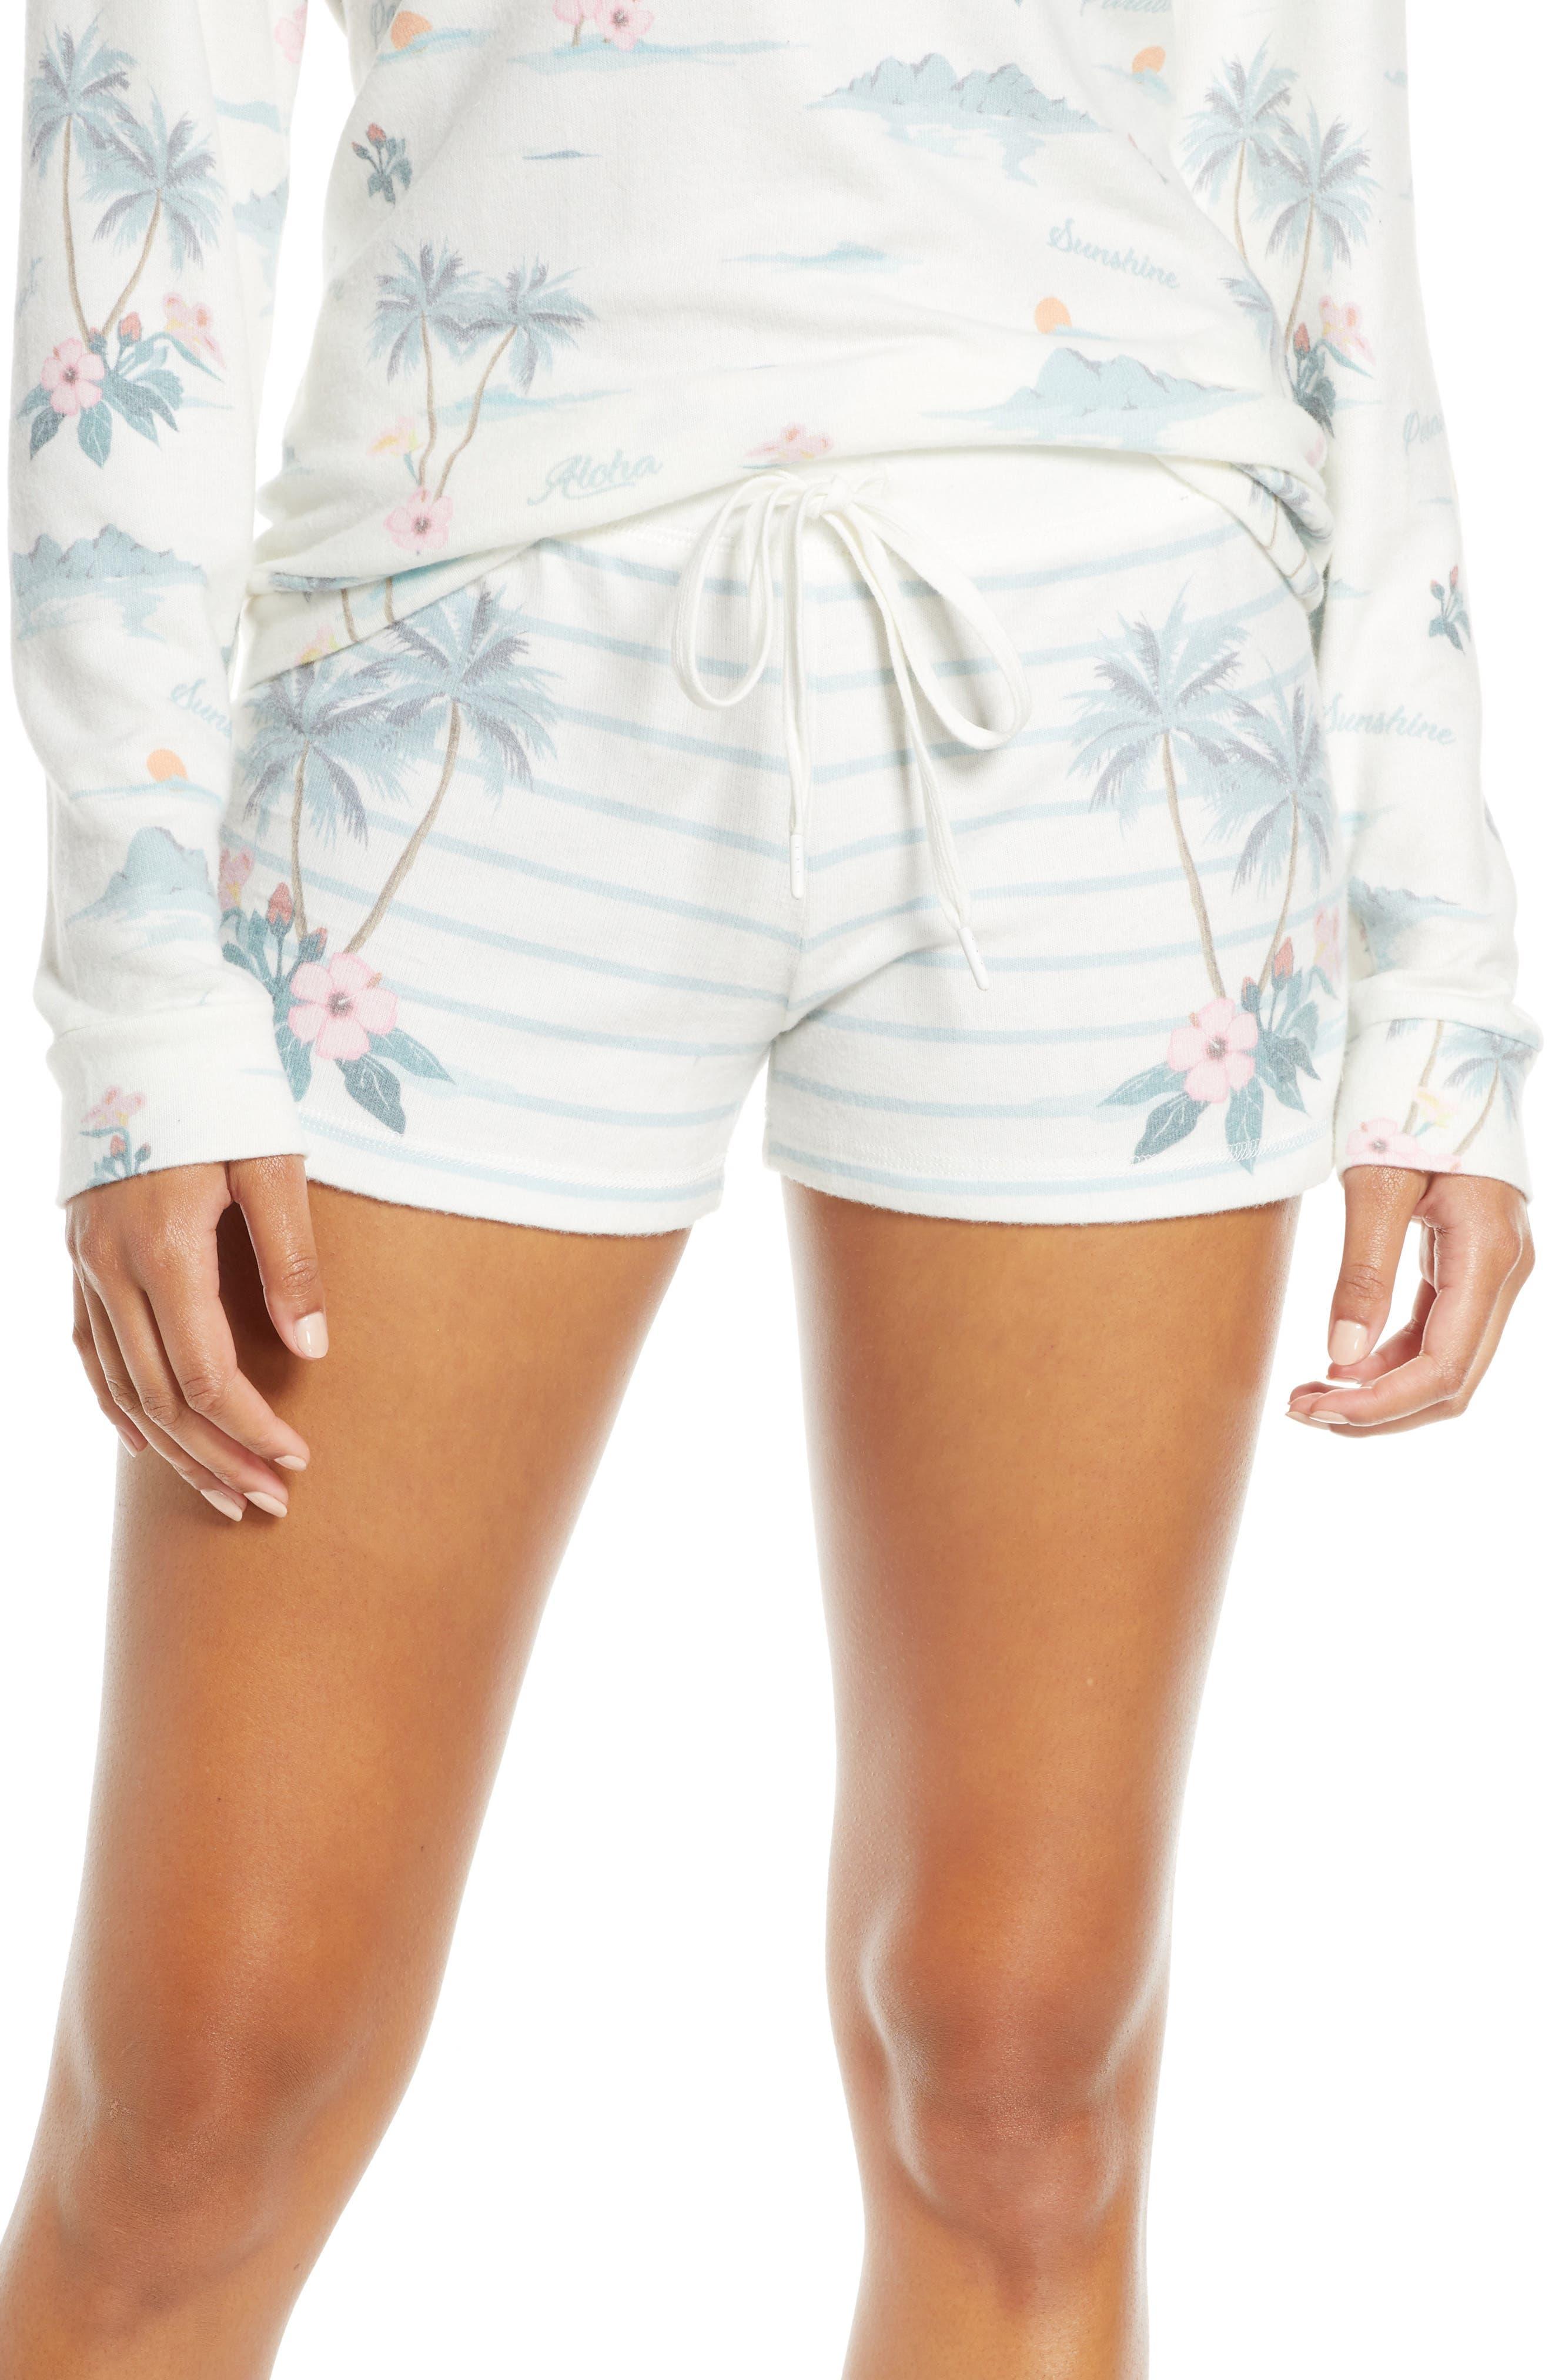 Pj Salvage Paradise Dream Stripe Pajama Shorts, Ivory